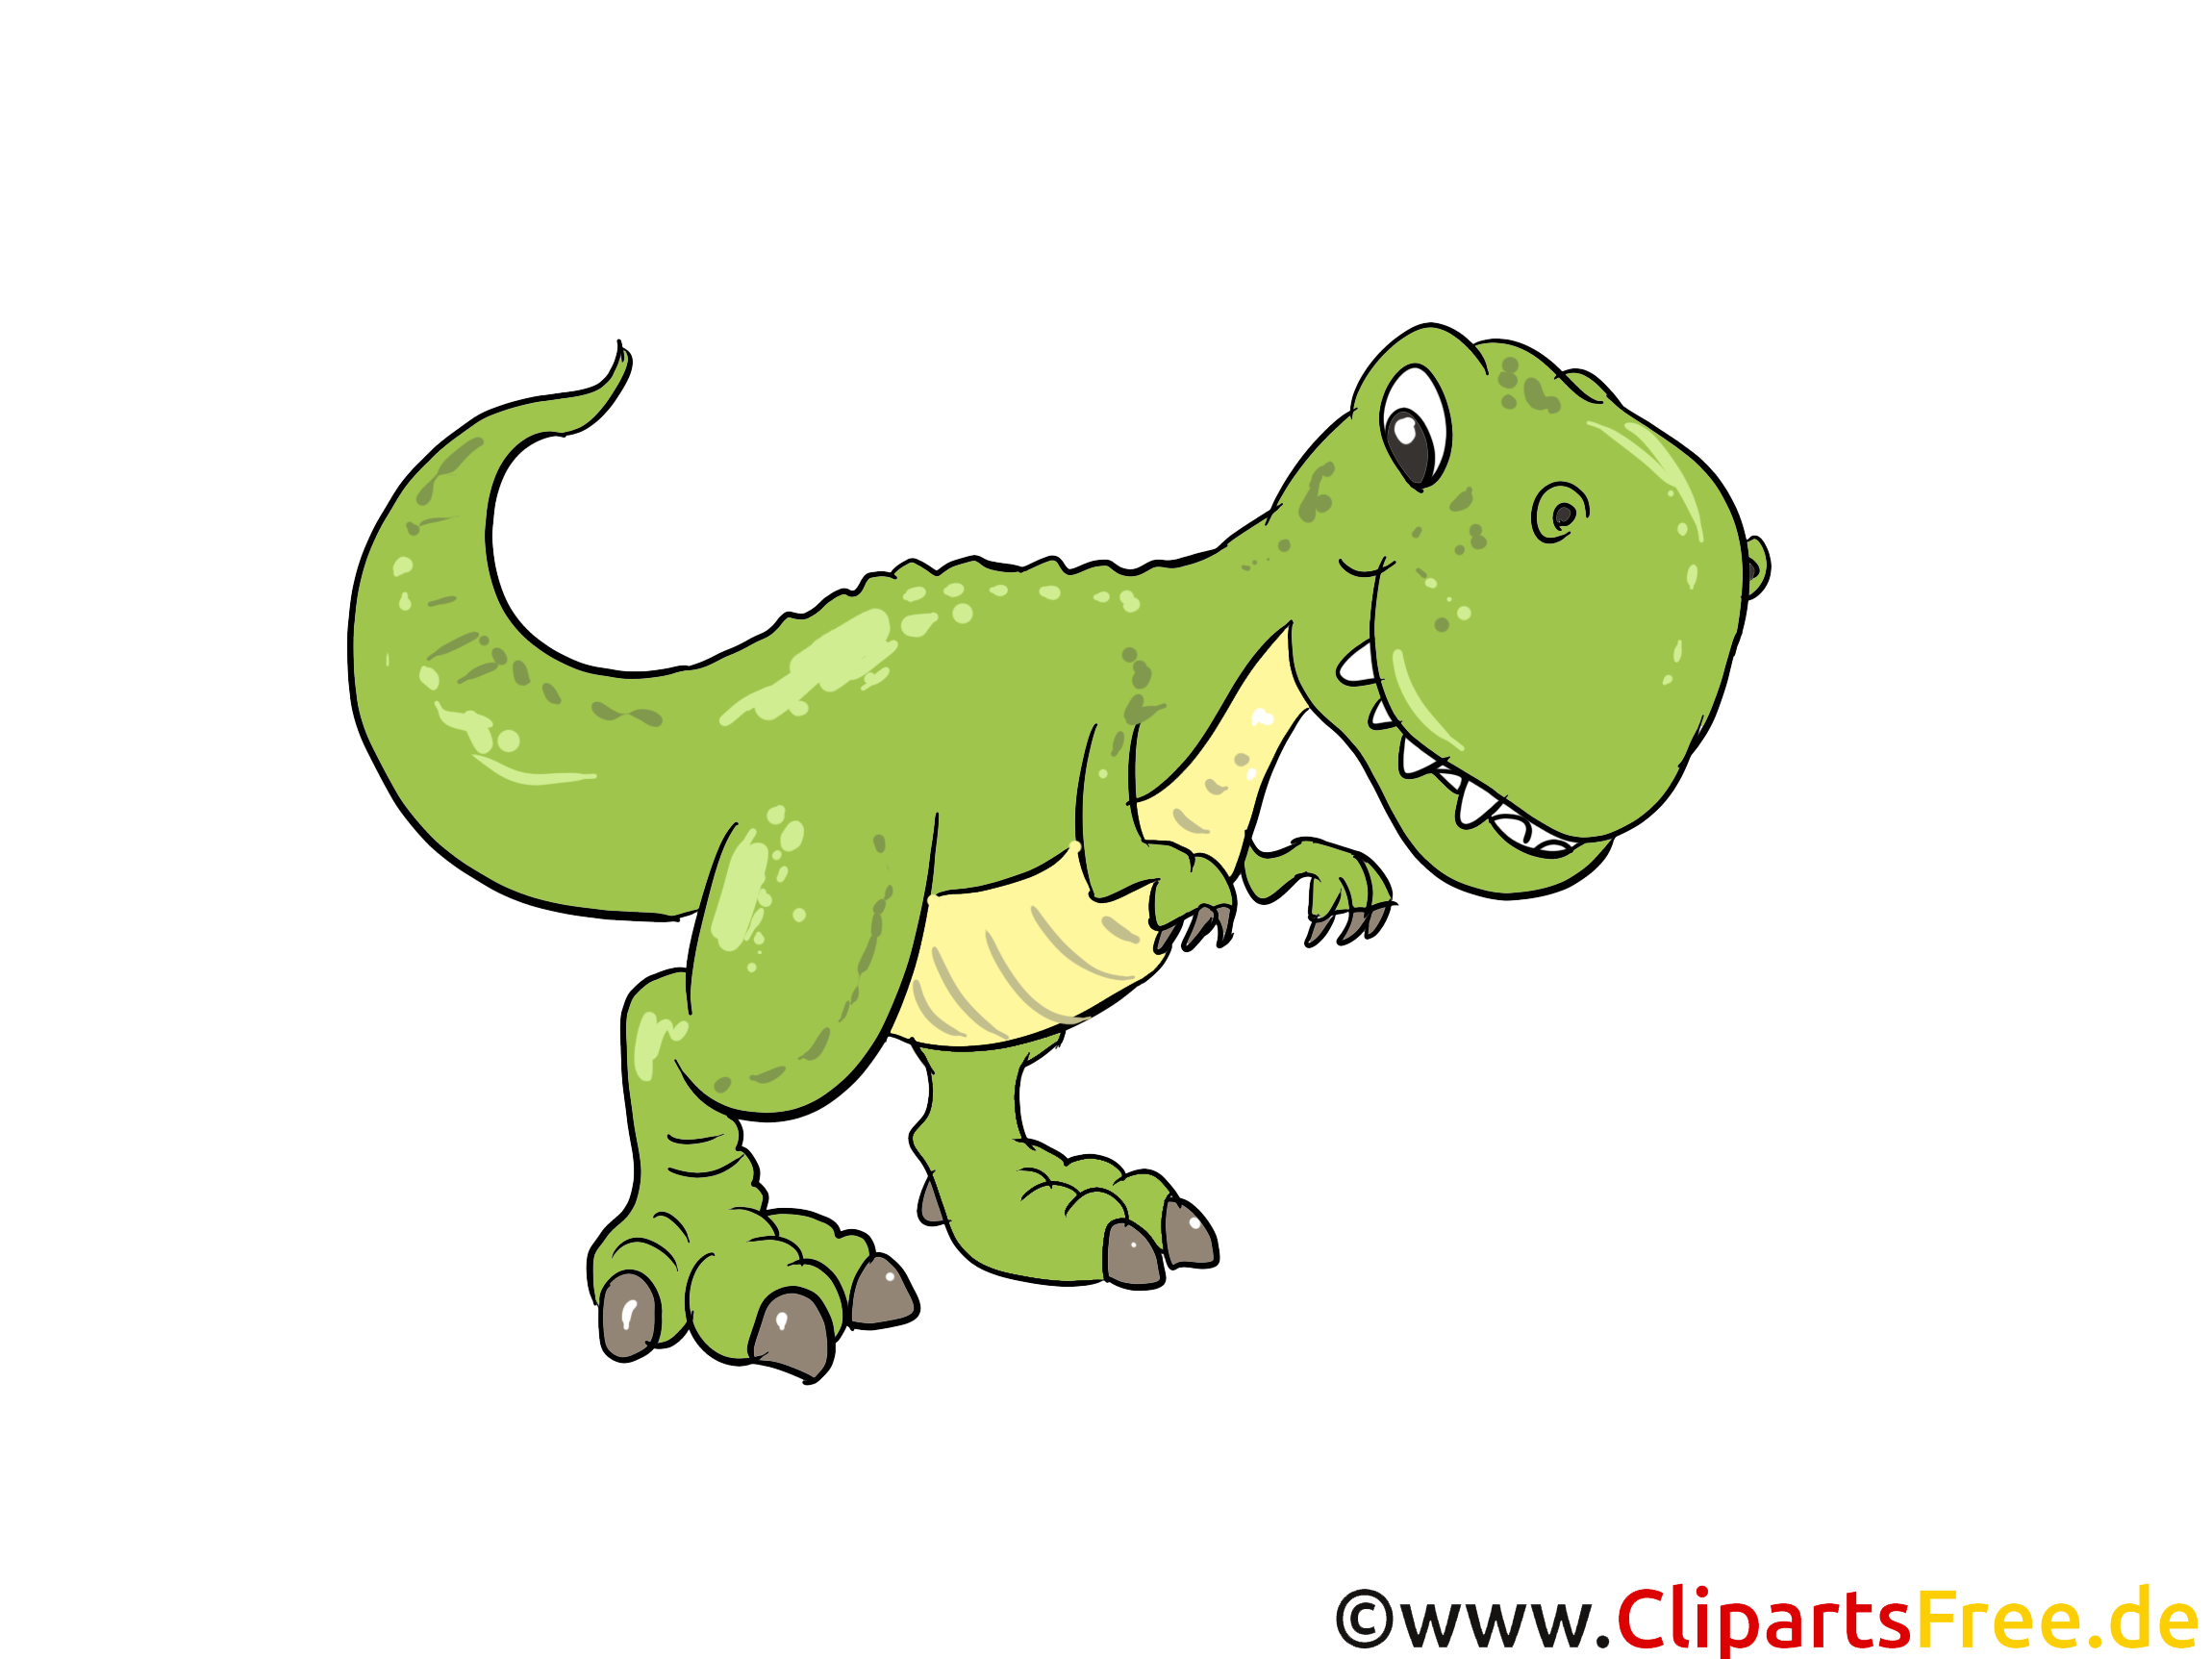 Dinosaurier Bilder, Cliparts, Gifs, Illustrationen, Grafiken kostenlos